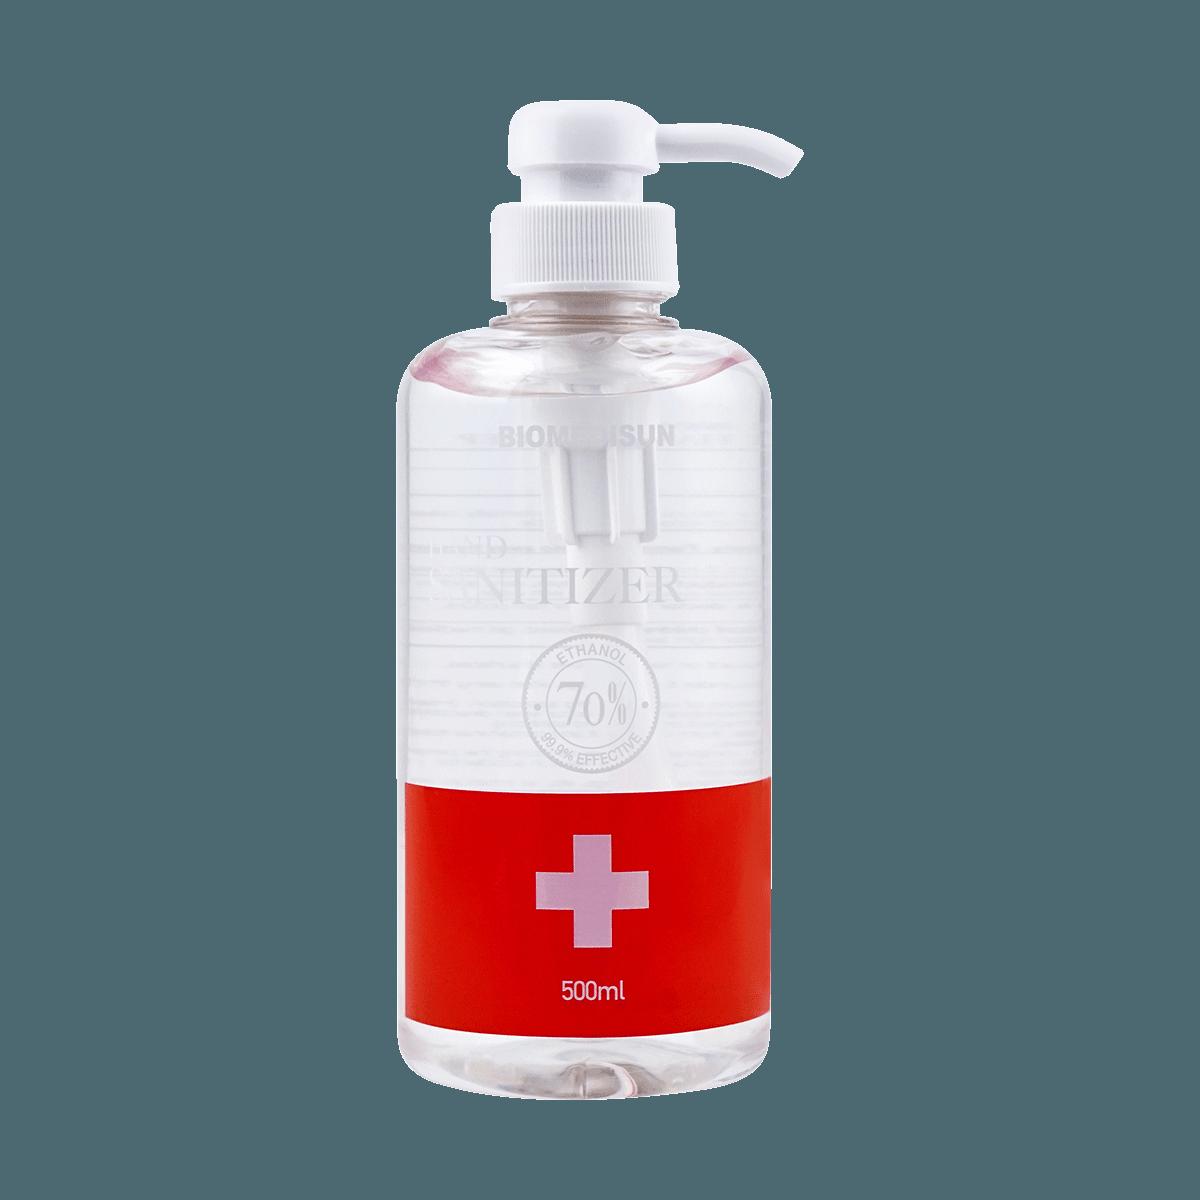 Yamibuy.com:Customer reviews:BIOMEDISUN HAND SANITIZER (70% Alcohol) 500ml